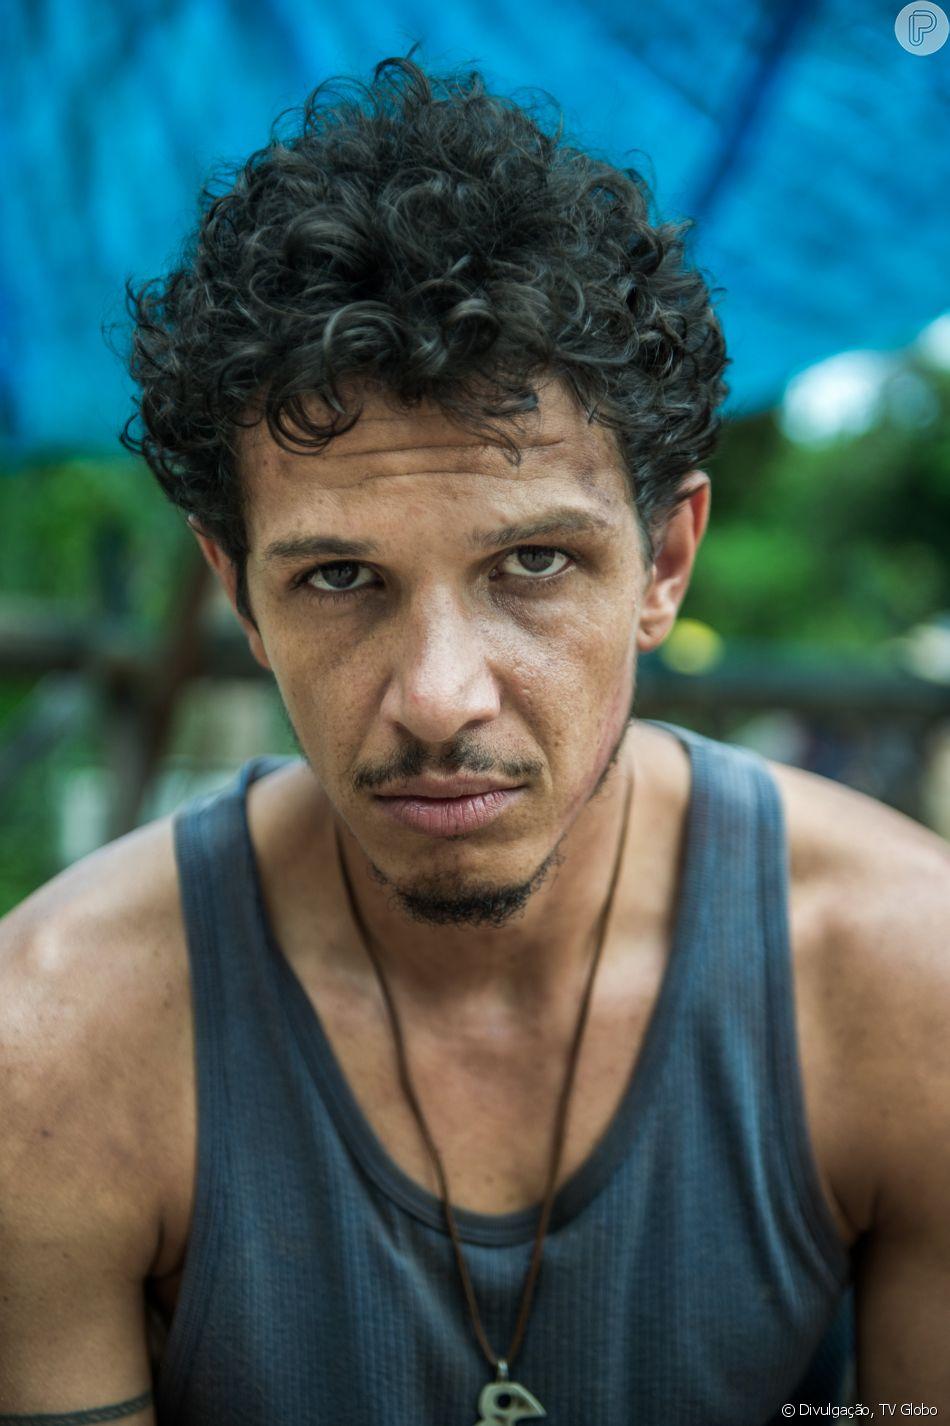 Zé Victor (Rafael Losso) leva surra de mulheres ao tentar matar Caetana (Laura Cardoso) e acaba preso durante o julgamento de Sophia (Marieta Severo) na última semana da novela 'O Outro Lado do Paraíso'